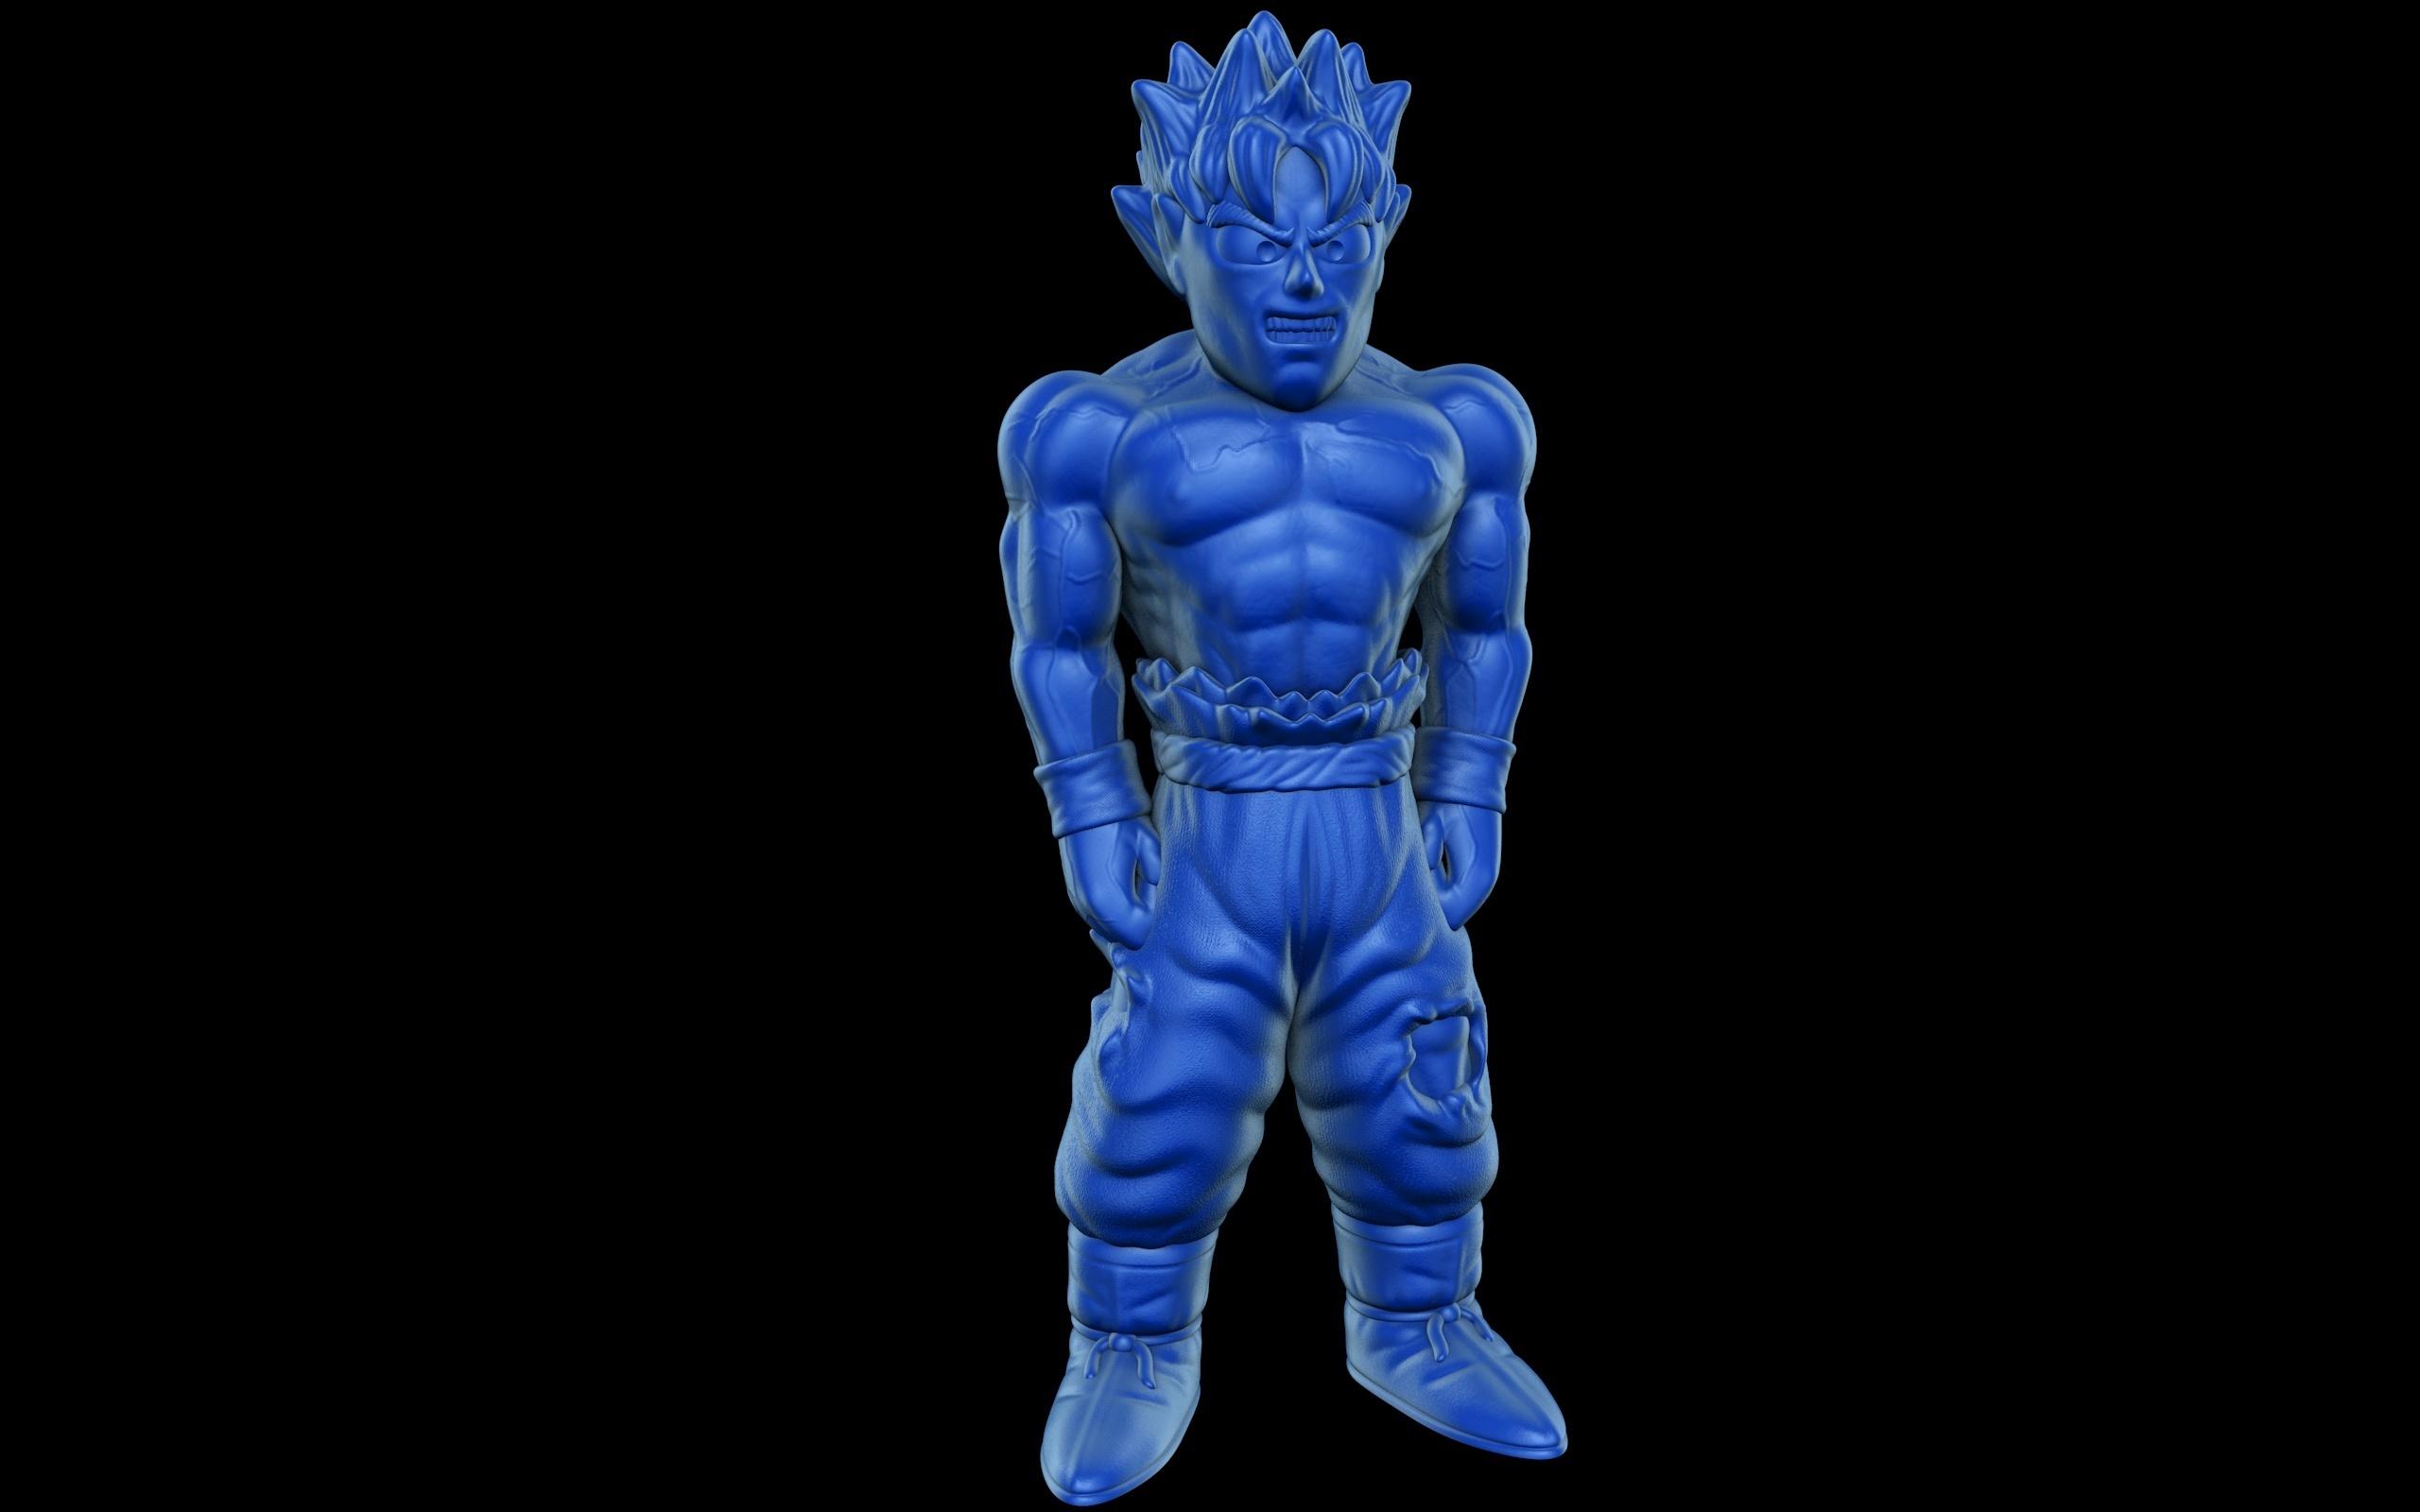 Goku.jpg Download free STL file Goku (Easy print no support) • 3D printing template, Alsamen